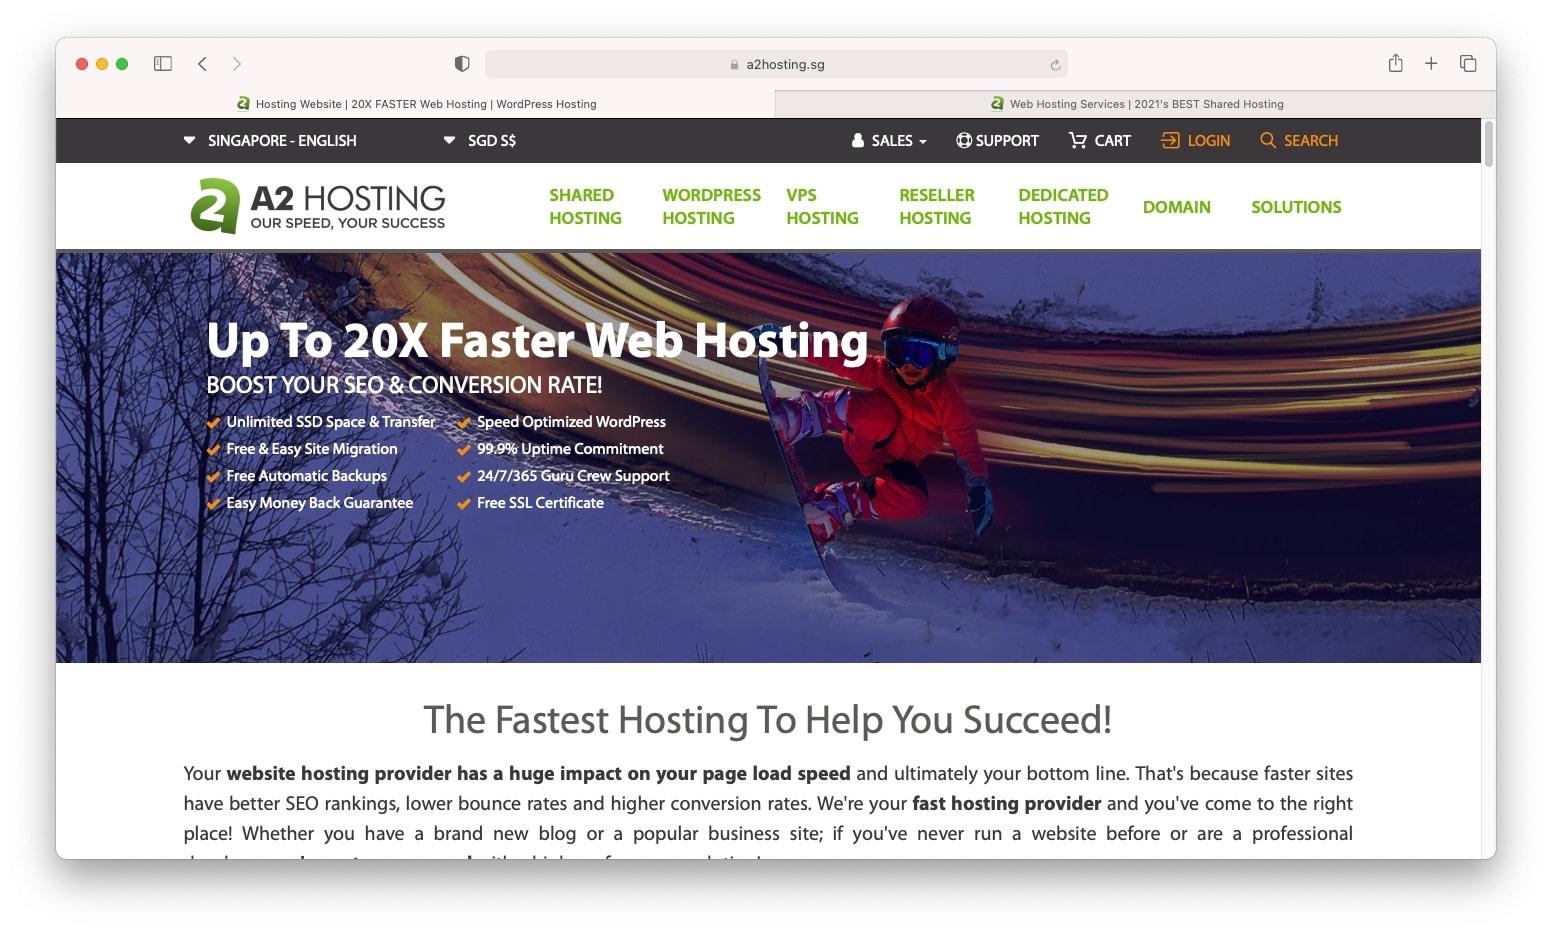 A2 Hosting是新加坡最好的网络托管选项之一